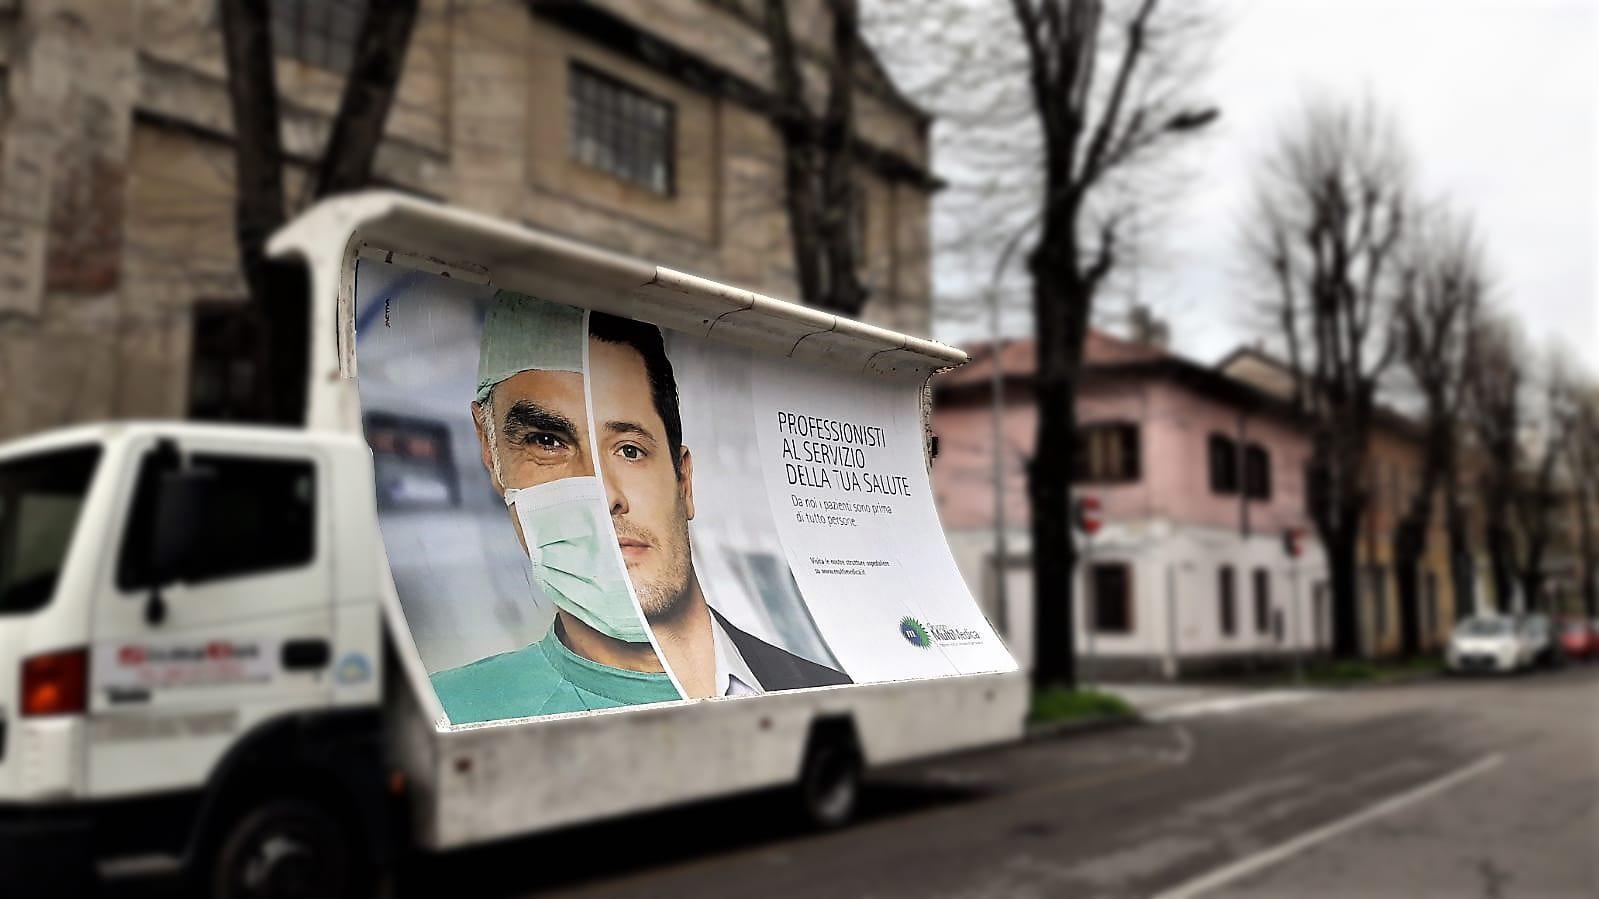 Affissioni Italia